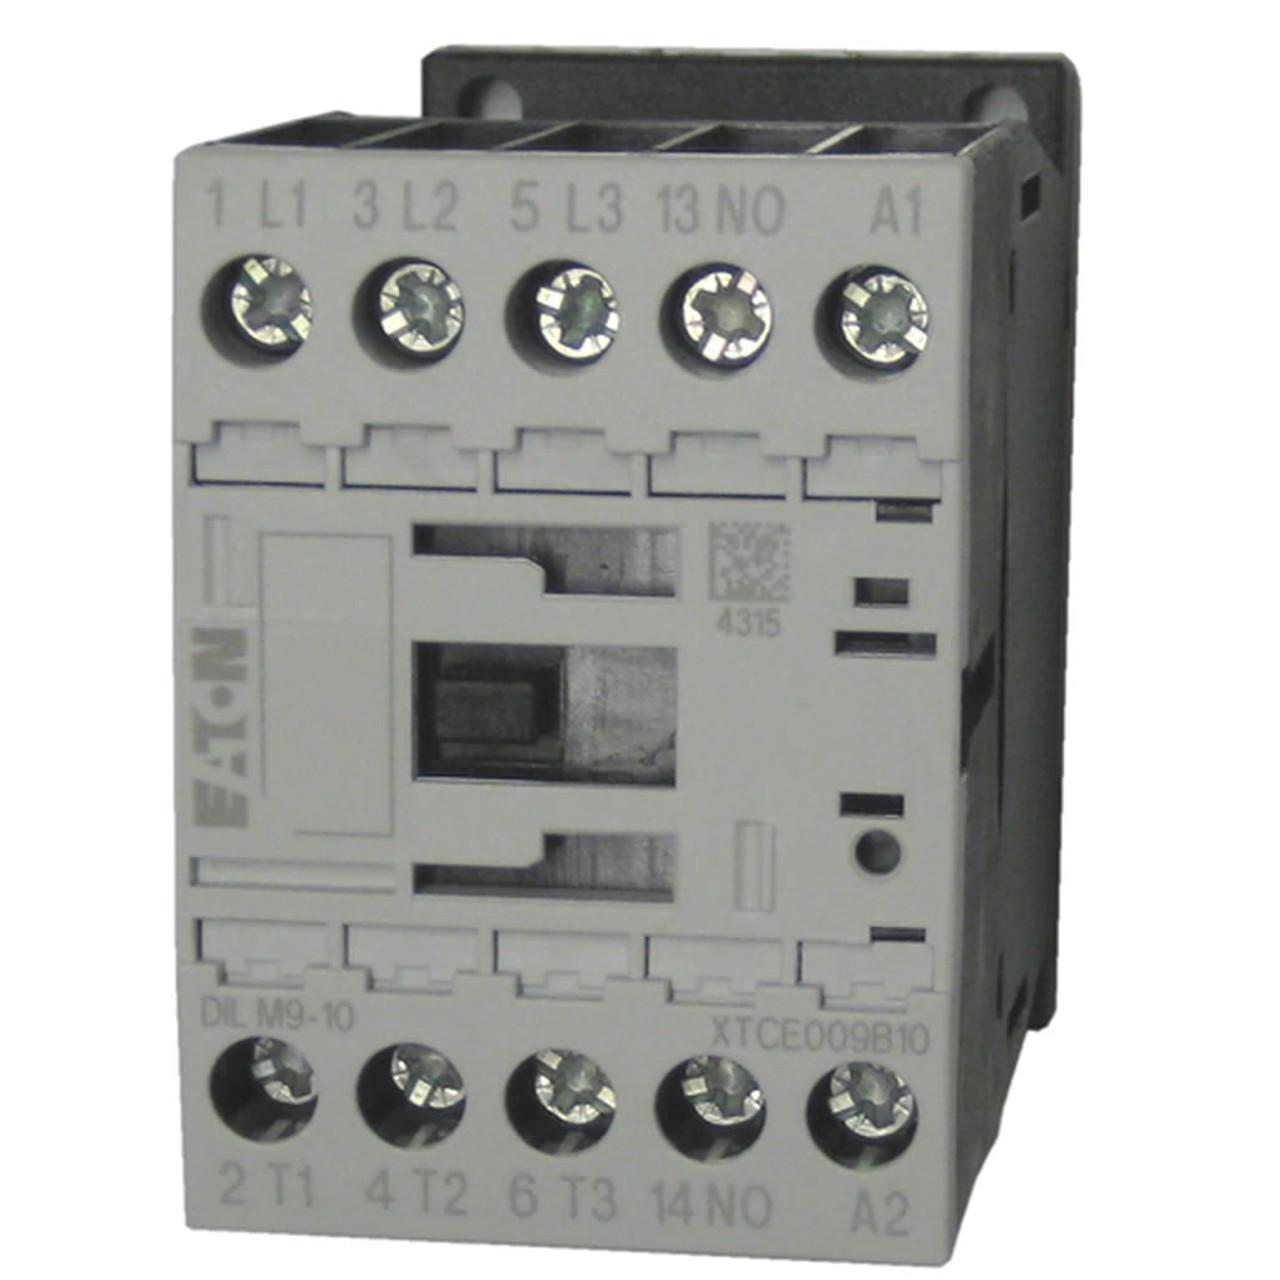 Eaton XTCE009B10L contactor